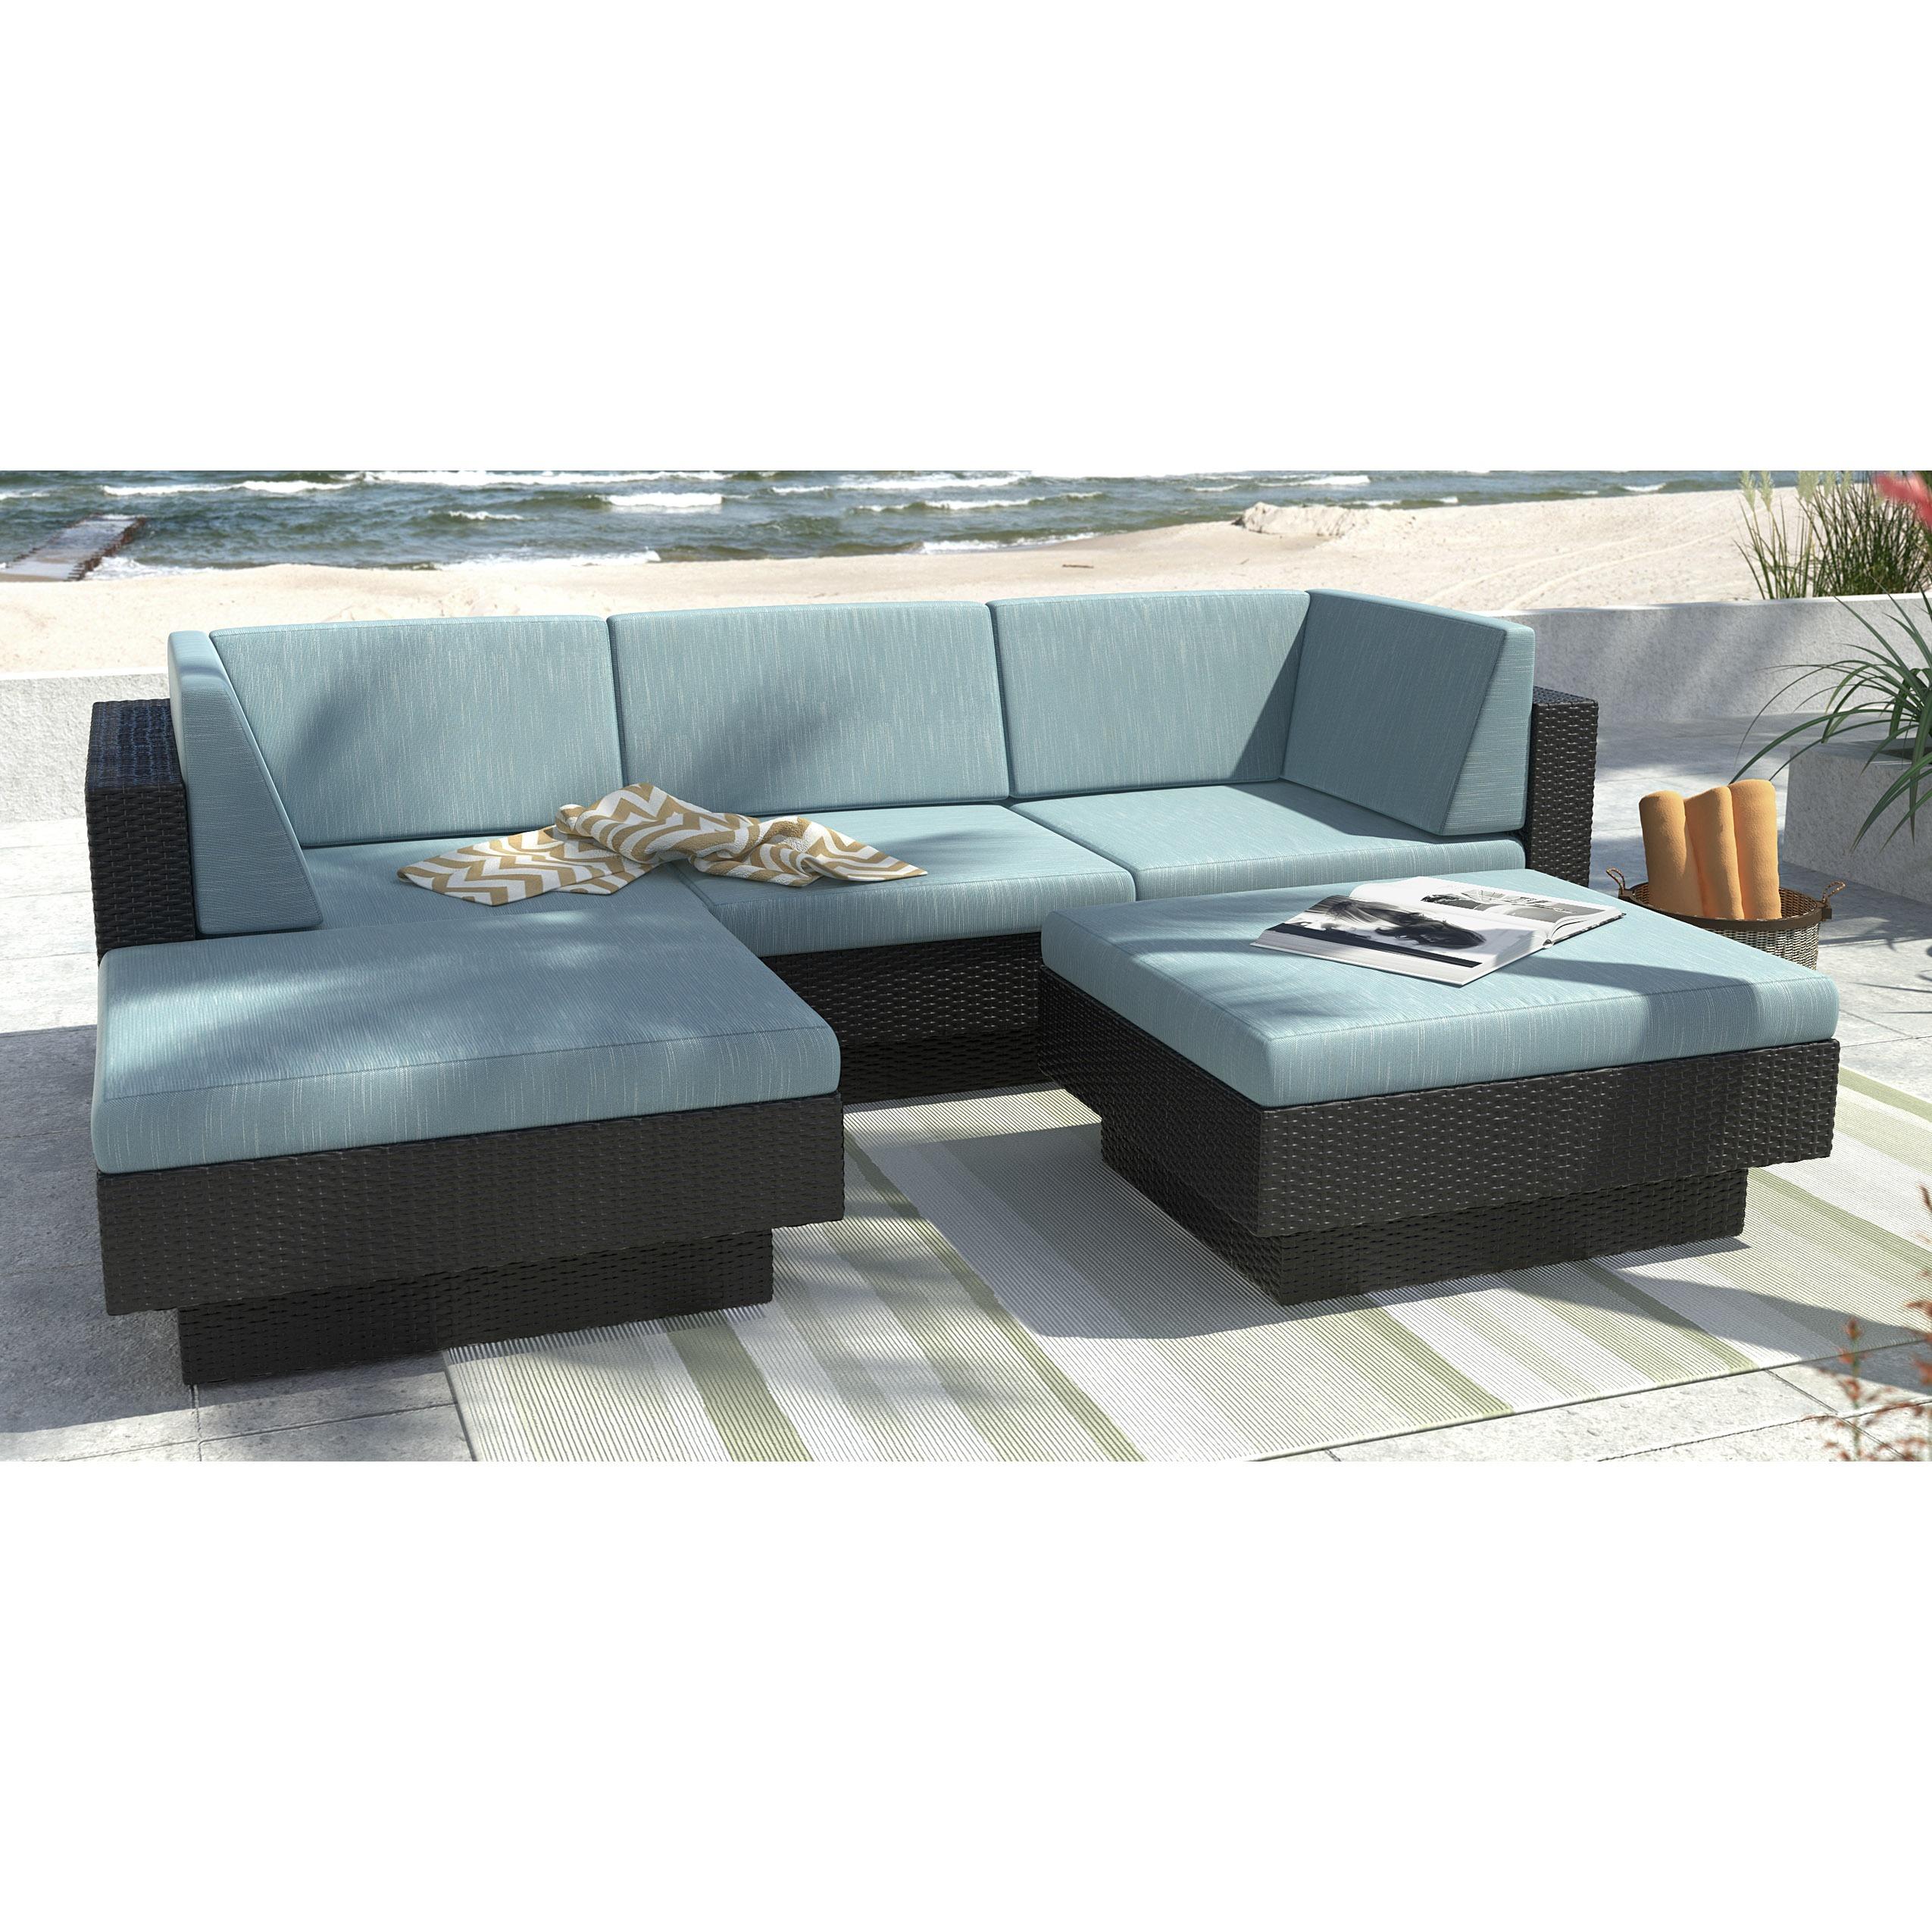 lake combo products tan piece furniture set khaki como seating deep dining patio and